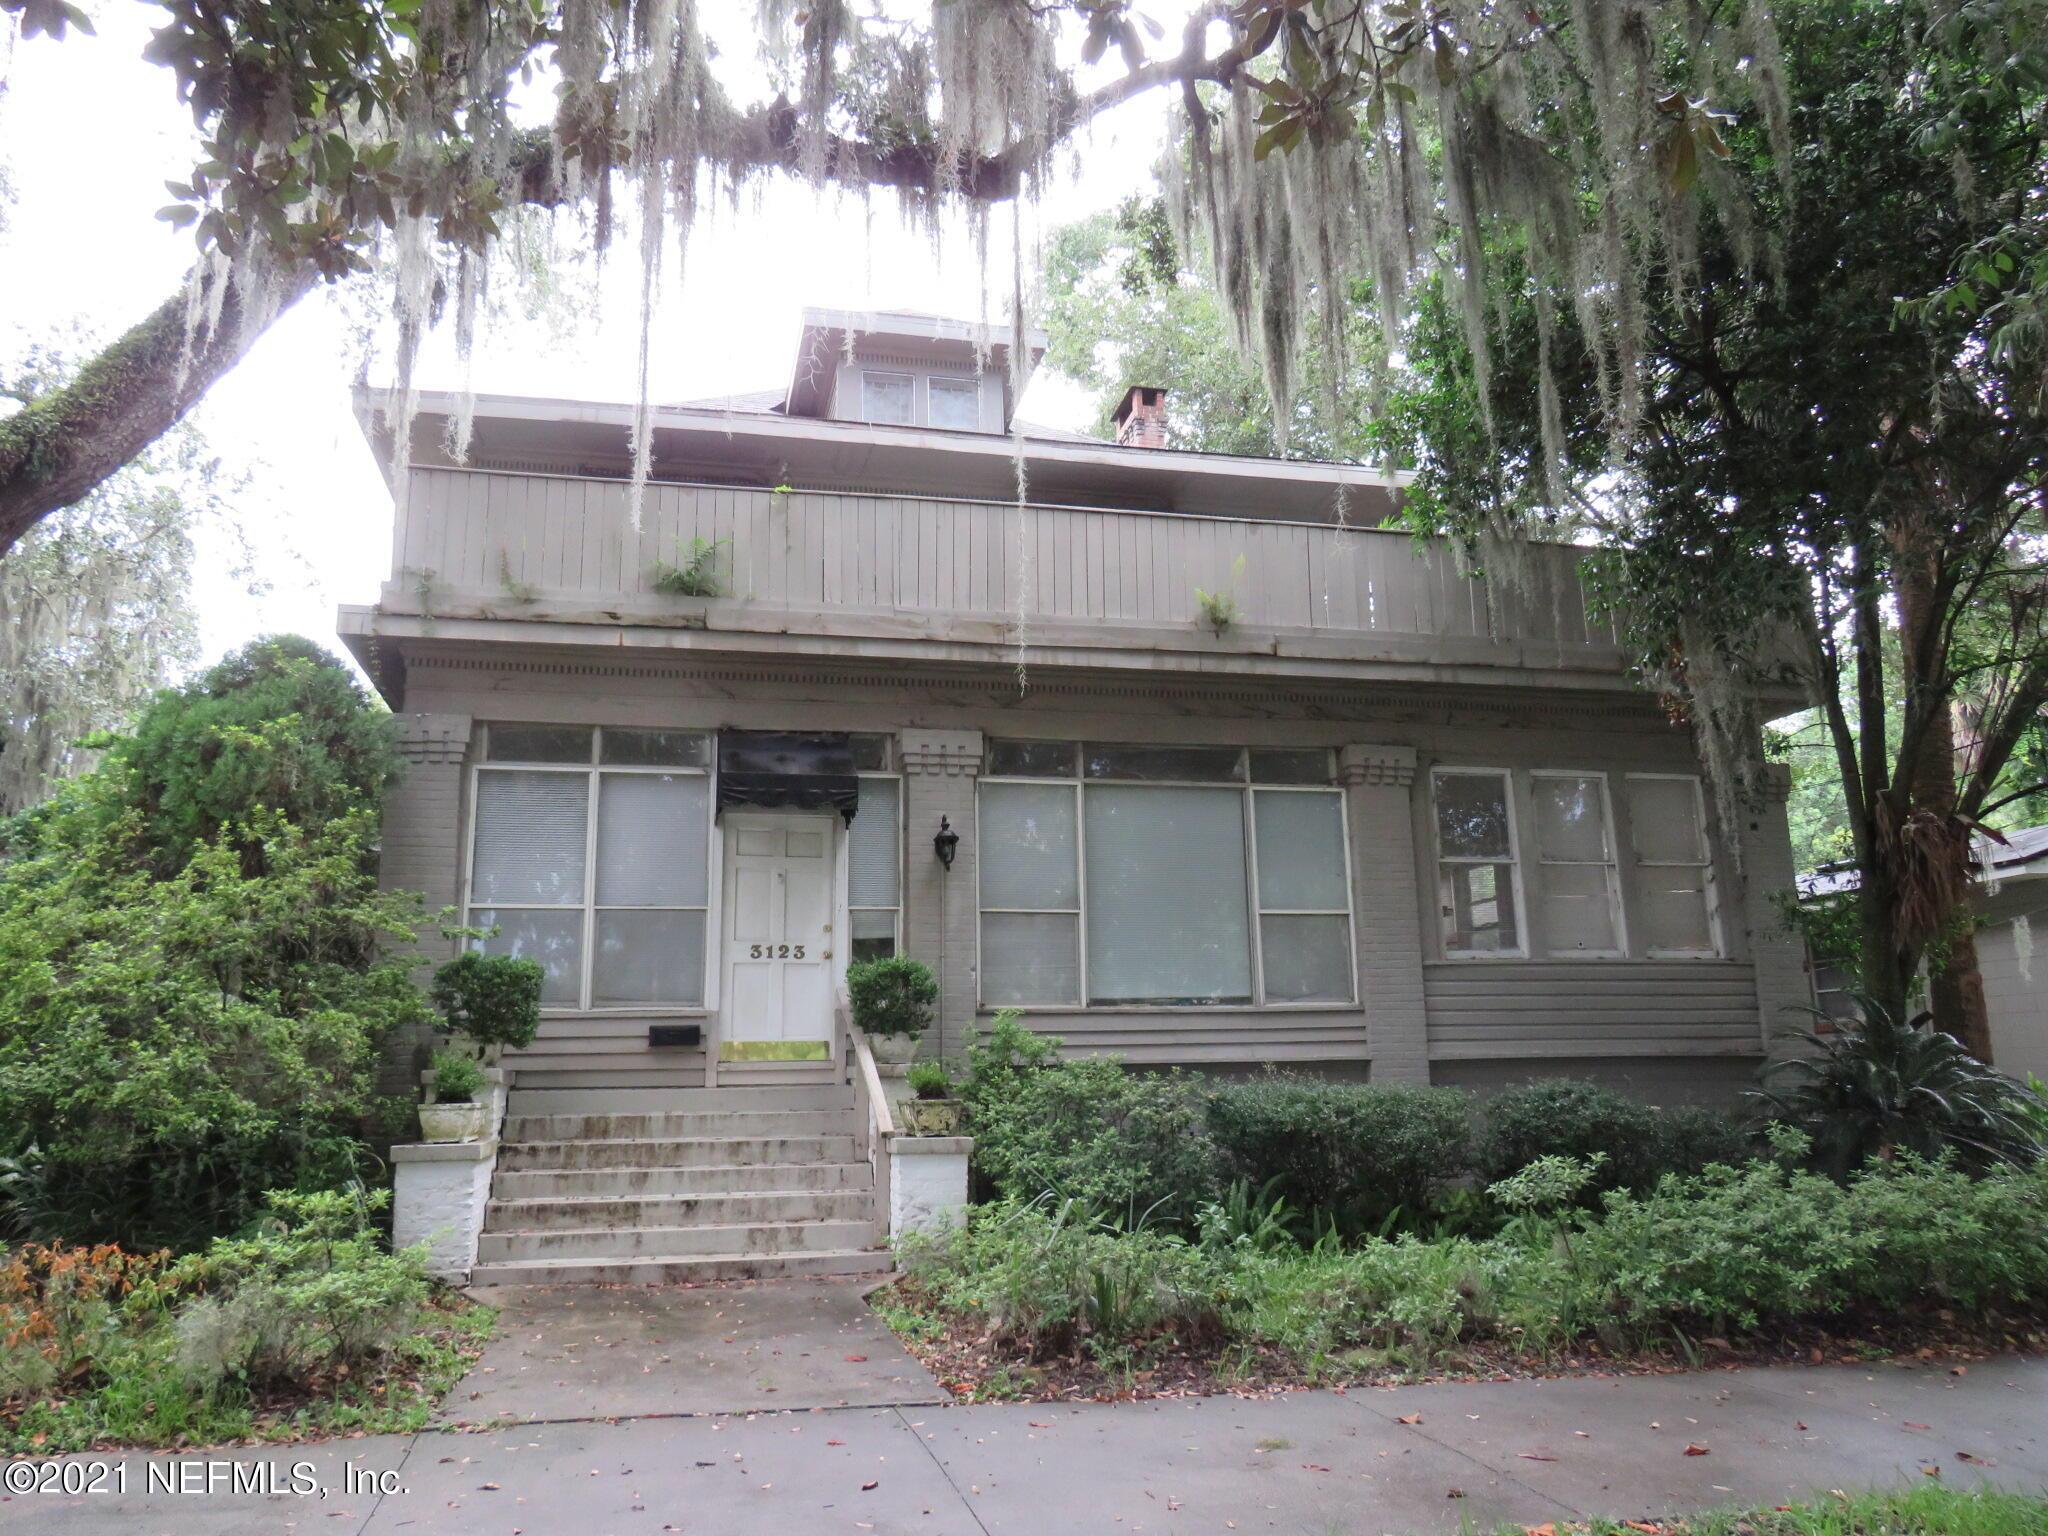 1721 ABERDEEN, JACKSONVILLE, FLORIDA 32205, 6 Bedrooms Bedrooms, ,7 BathroomsBathrooms,Investment / MultiFamily,For sale,ABERDEEN,1124798